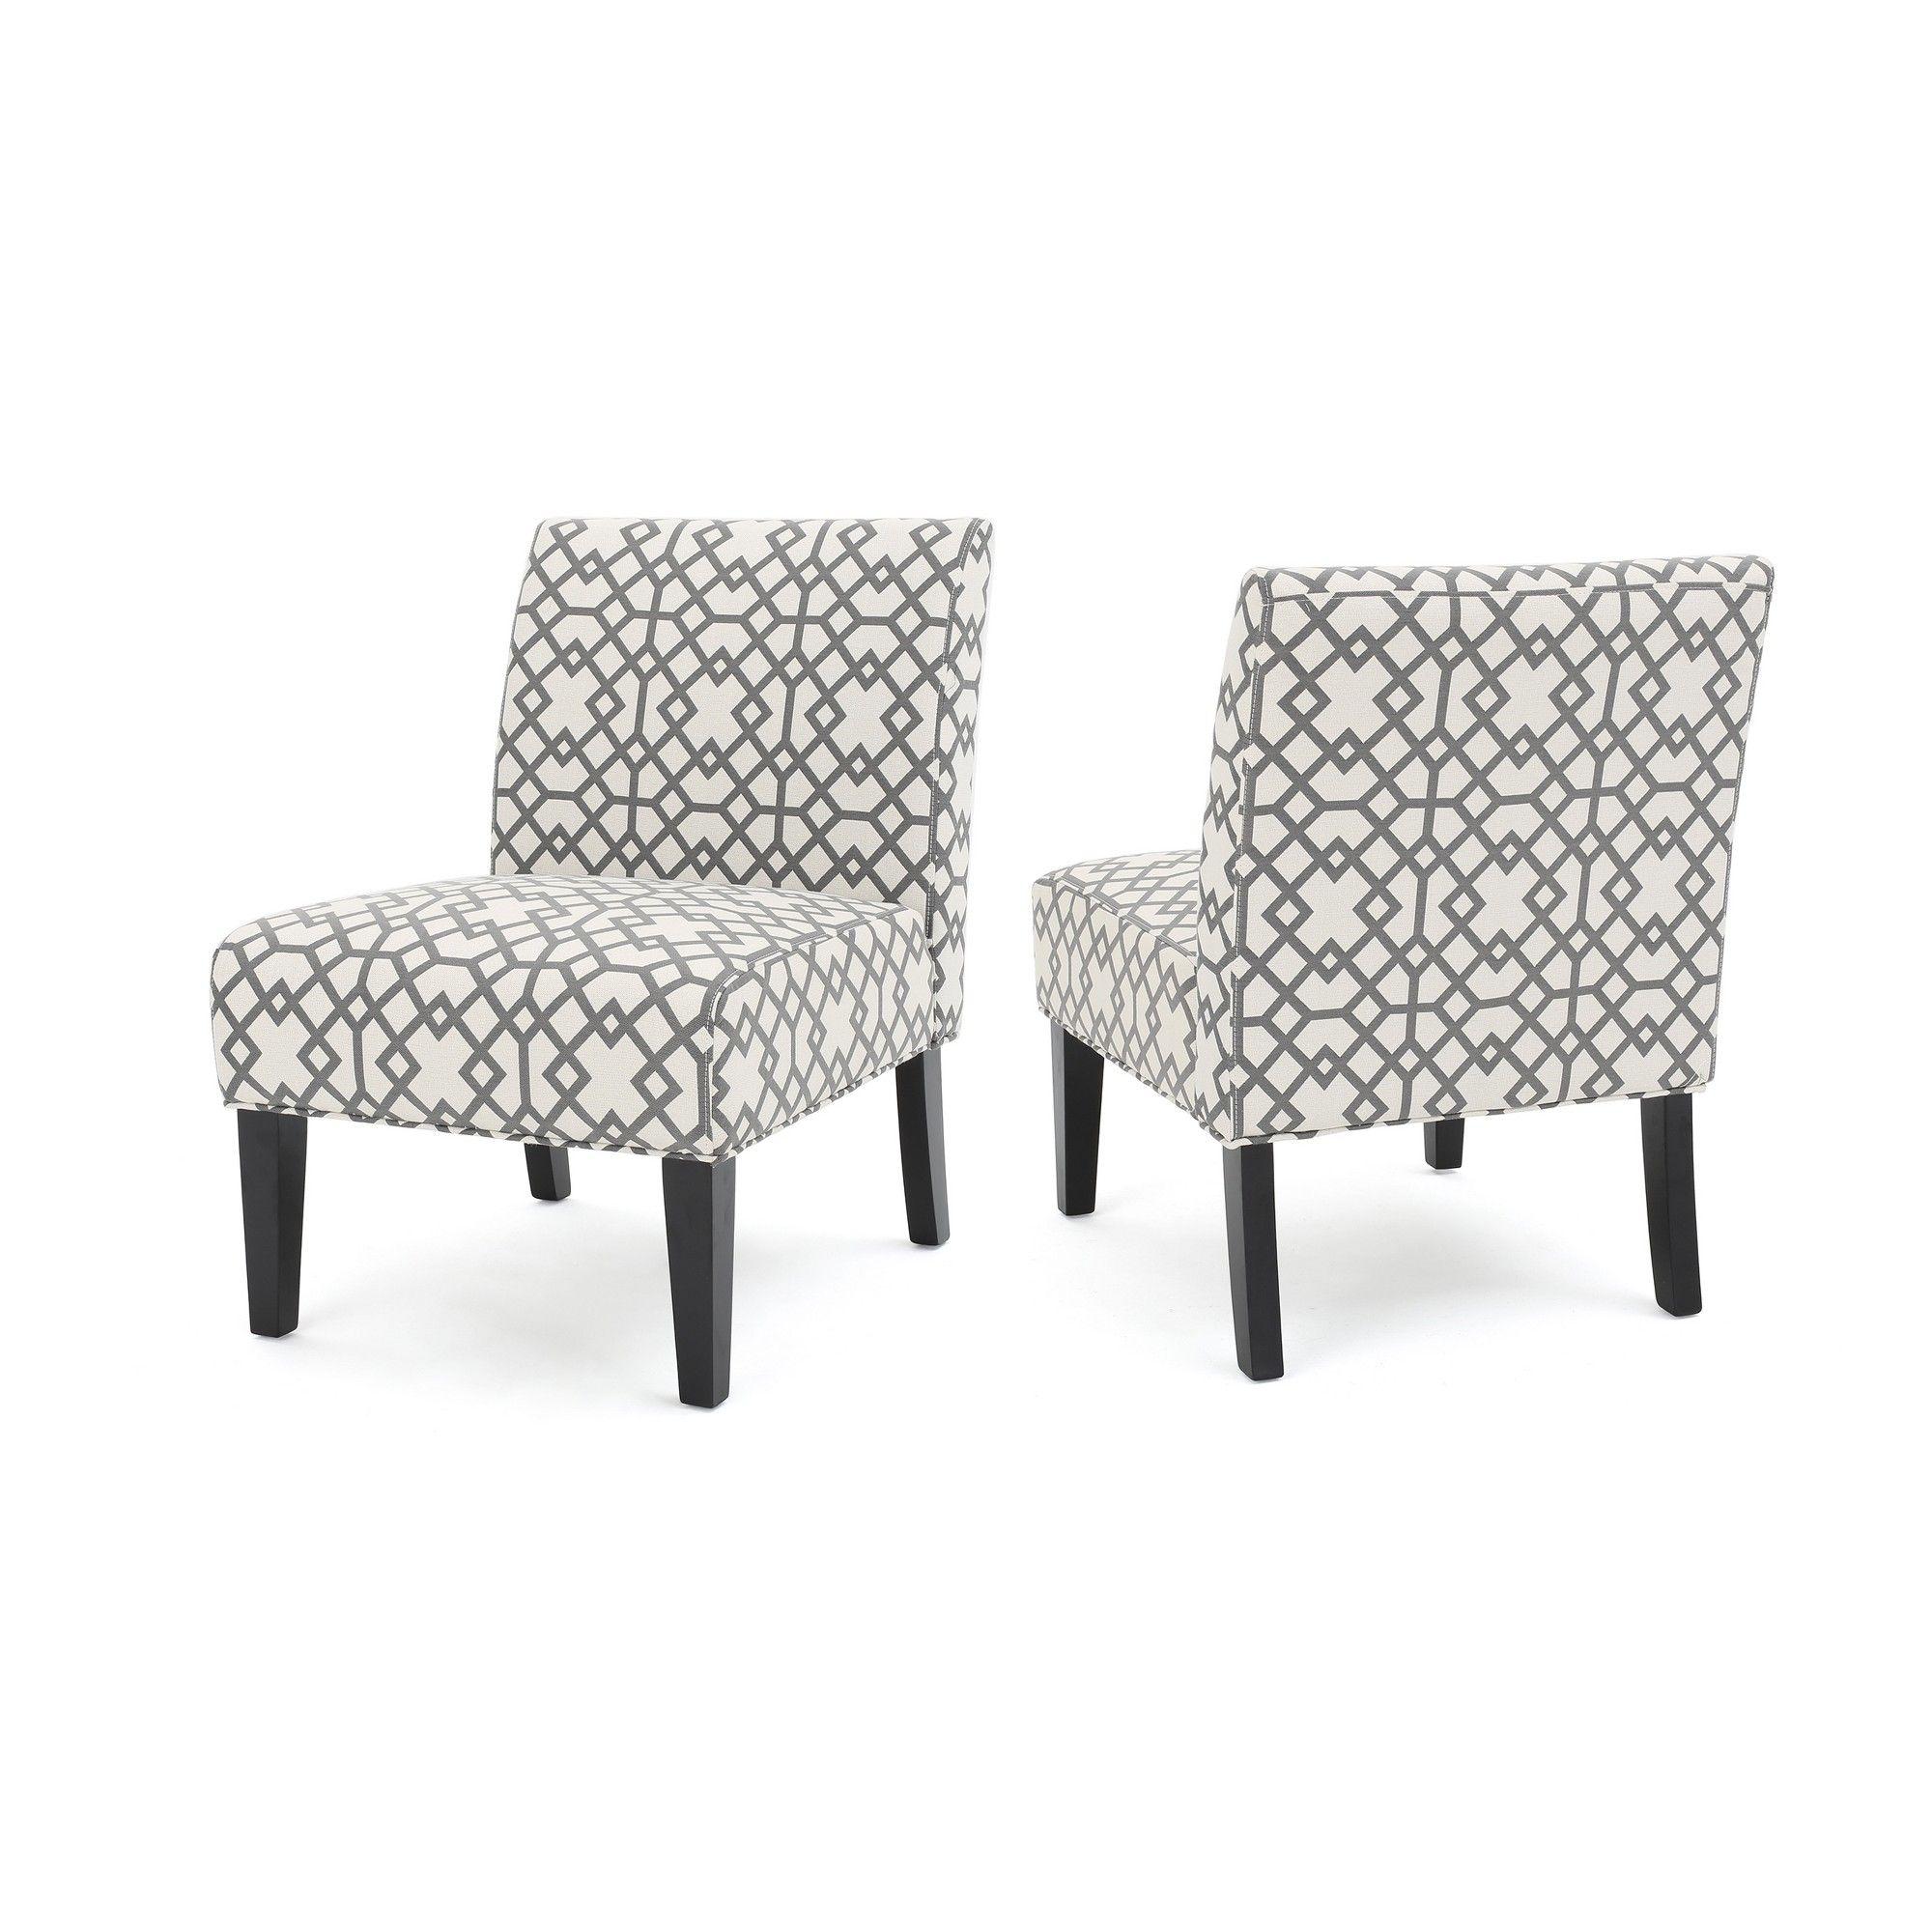 Terrific Set Of 2 Kassi Accent Chair Geometric Patterned Gray Inzonedesignstudio Interior Chair Design Inzonedesignstudiocom